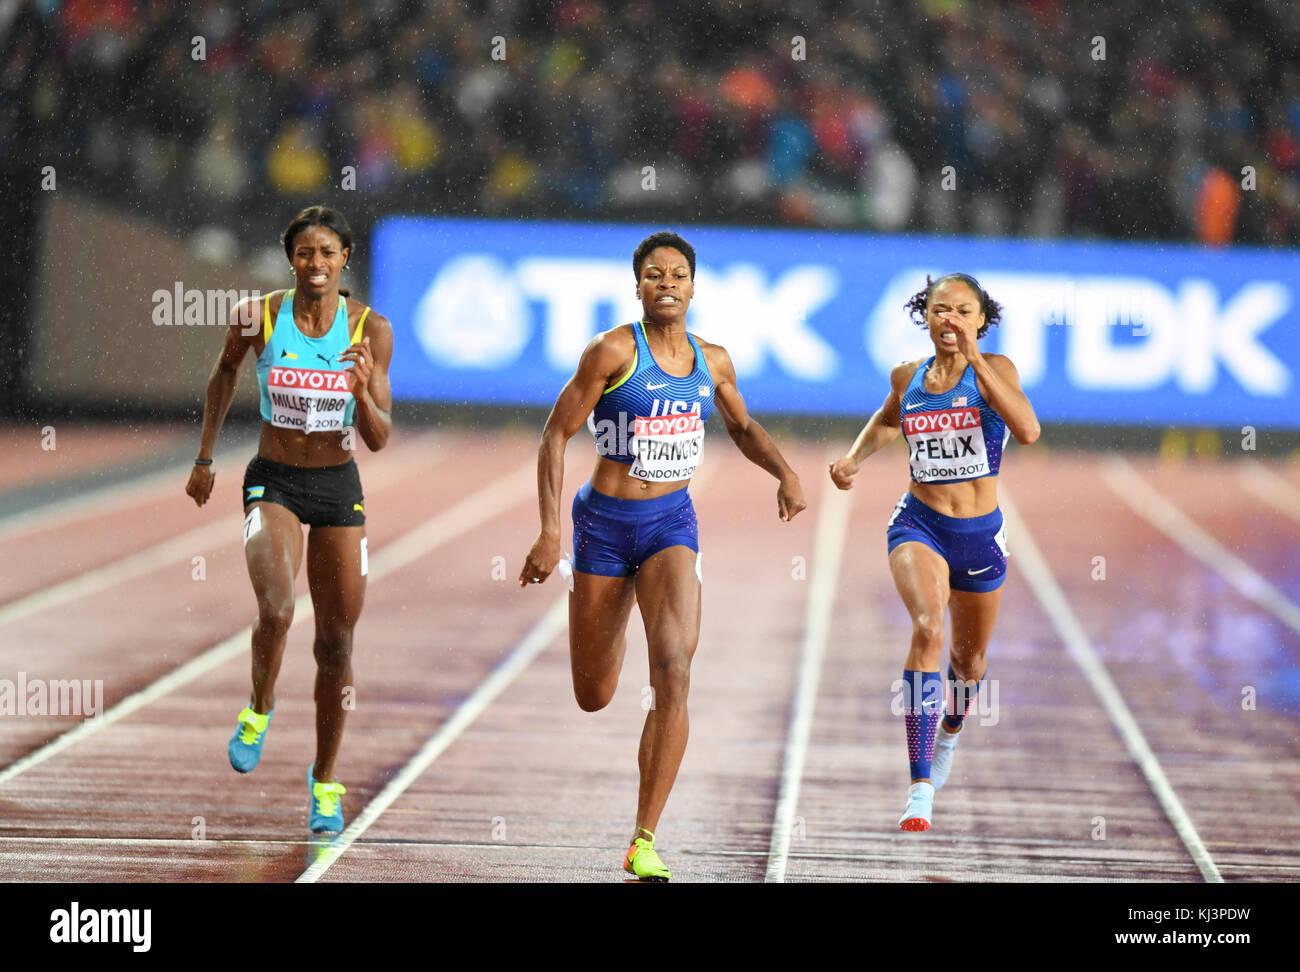 Phillys Francis (USA) wins the 400m women, alonside Allyson Felix (USA)  and Shaunae Miller-Uibo (Bahamas) - IAAF - Stock Image